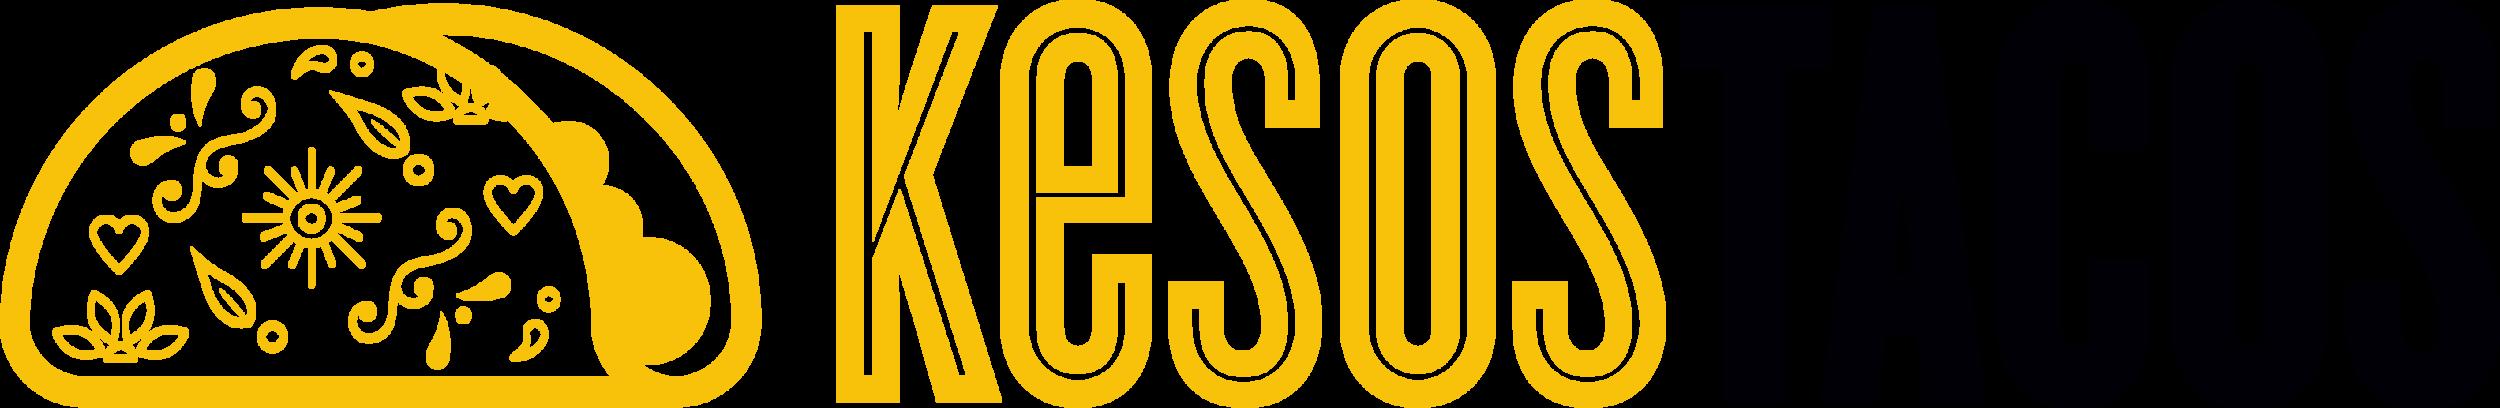 KesosTaco-Logo-Final(01-02)-HorizontalSideTaco.png